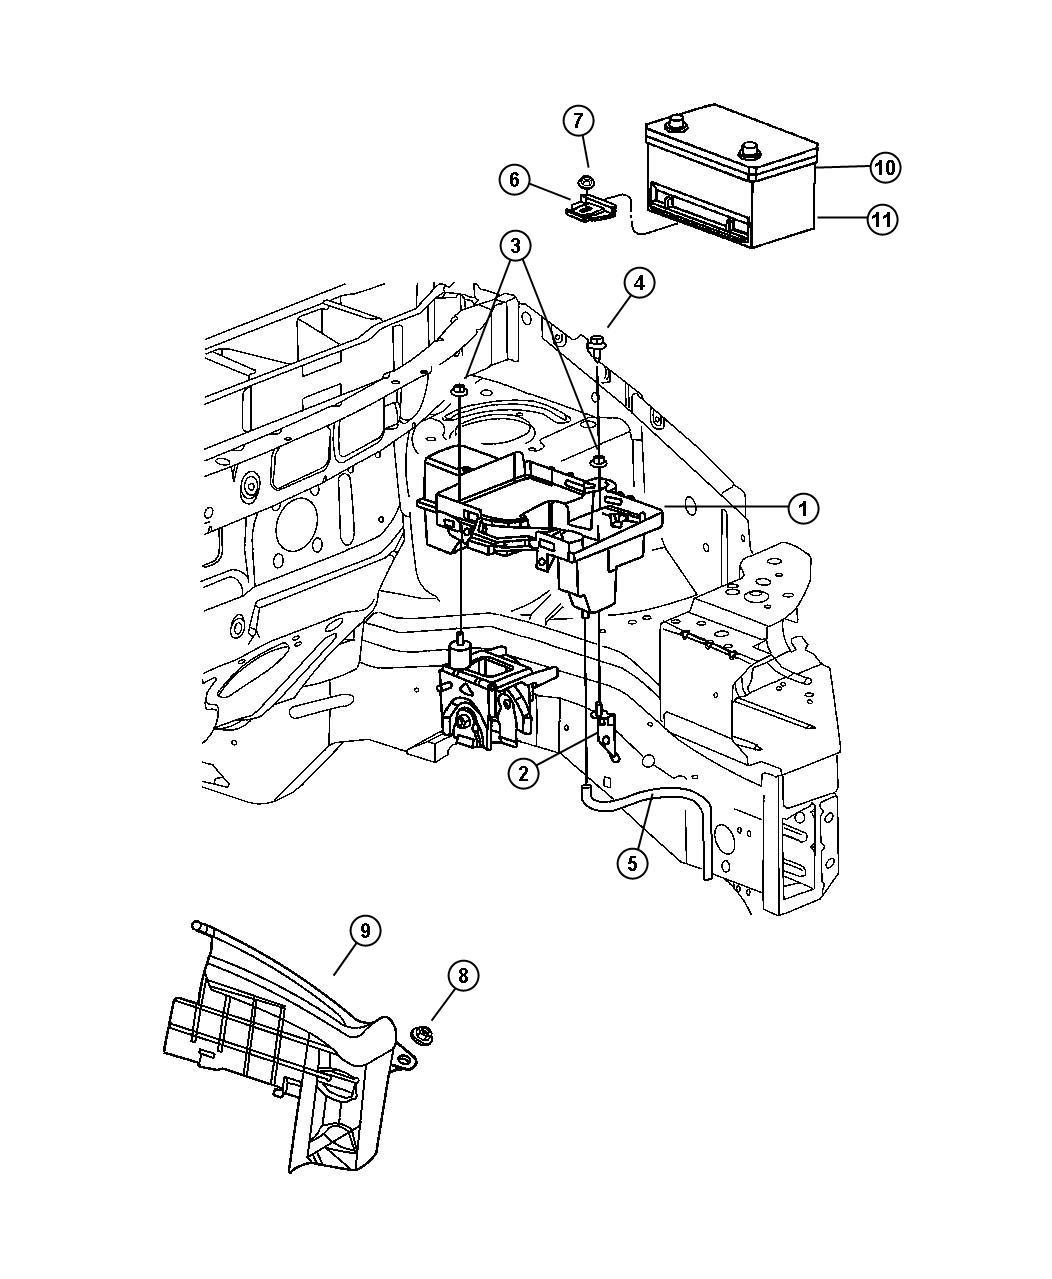 2014 Dodge Dart Wiring Diagram